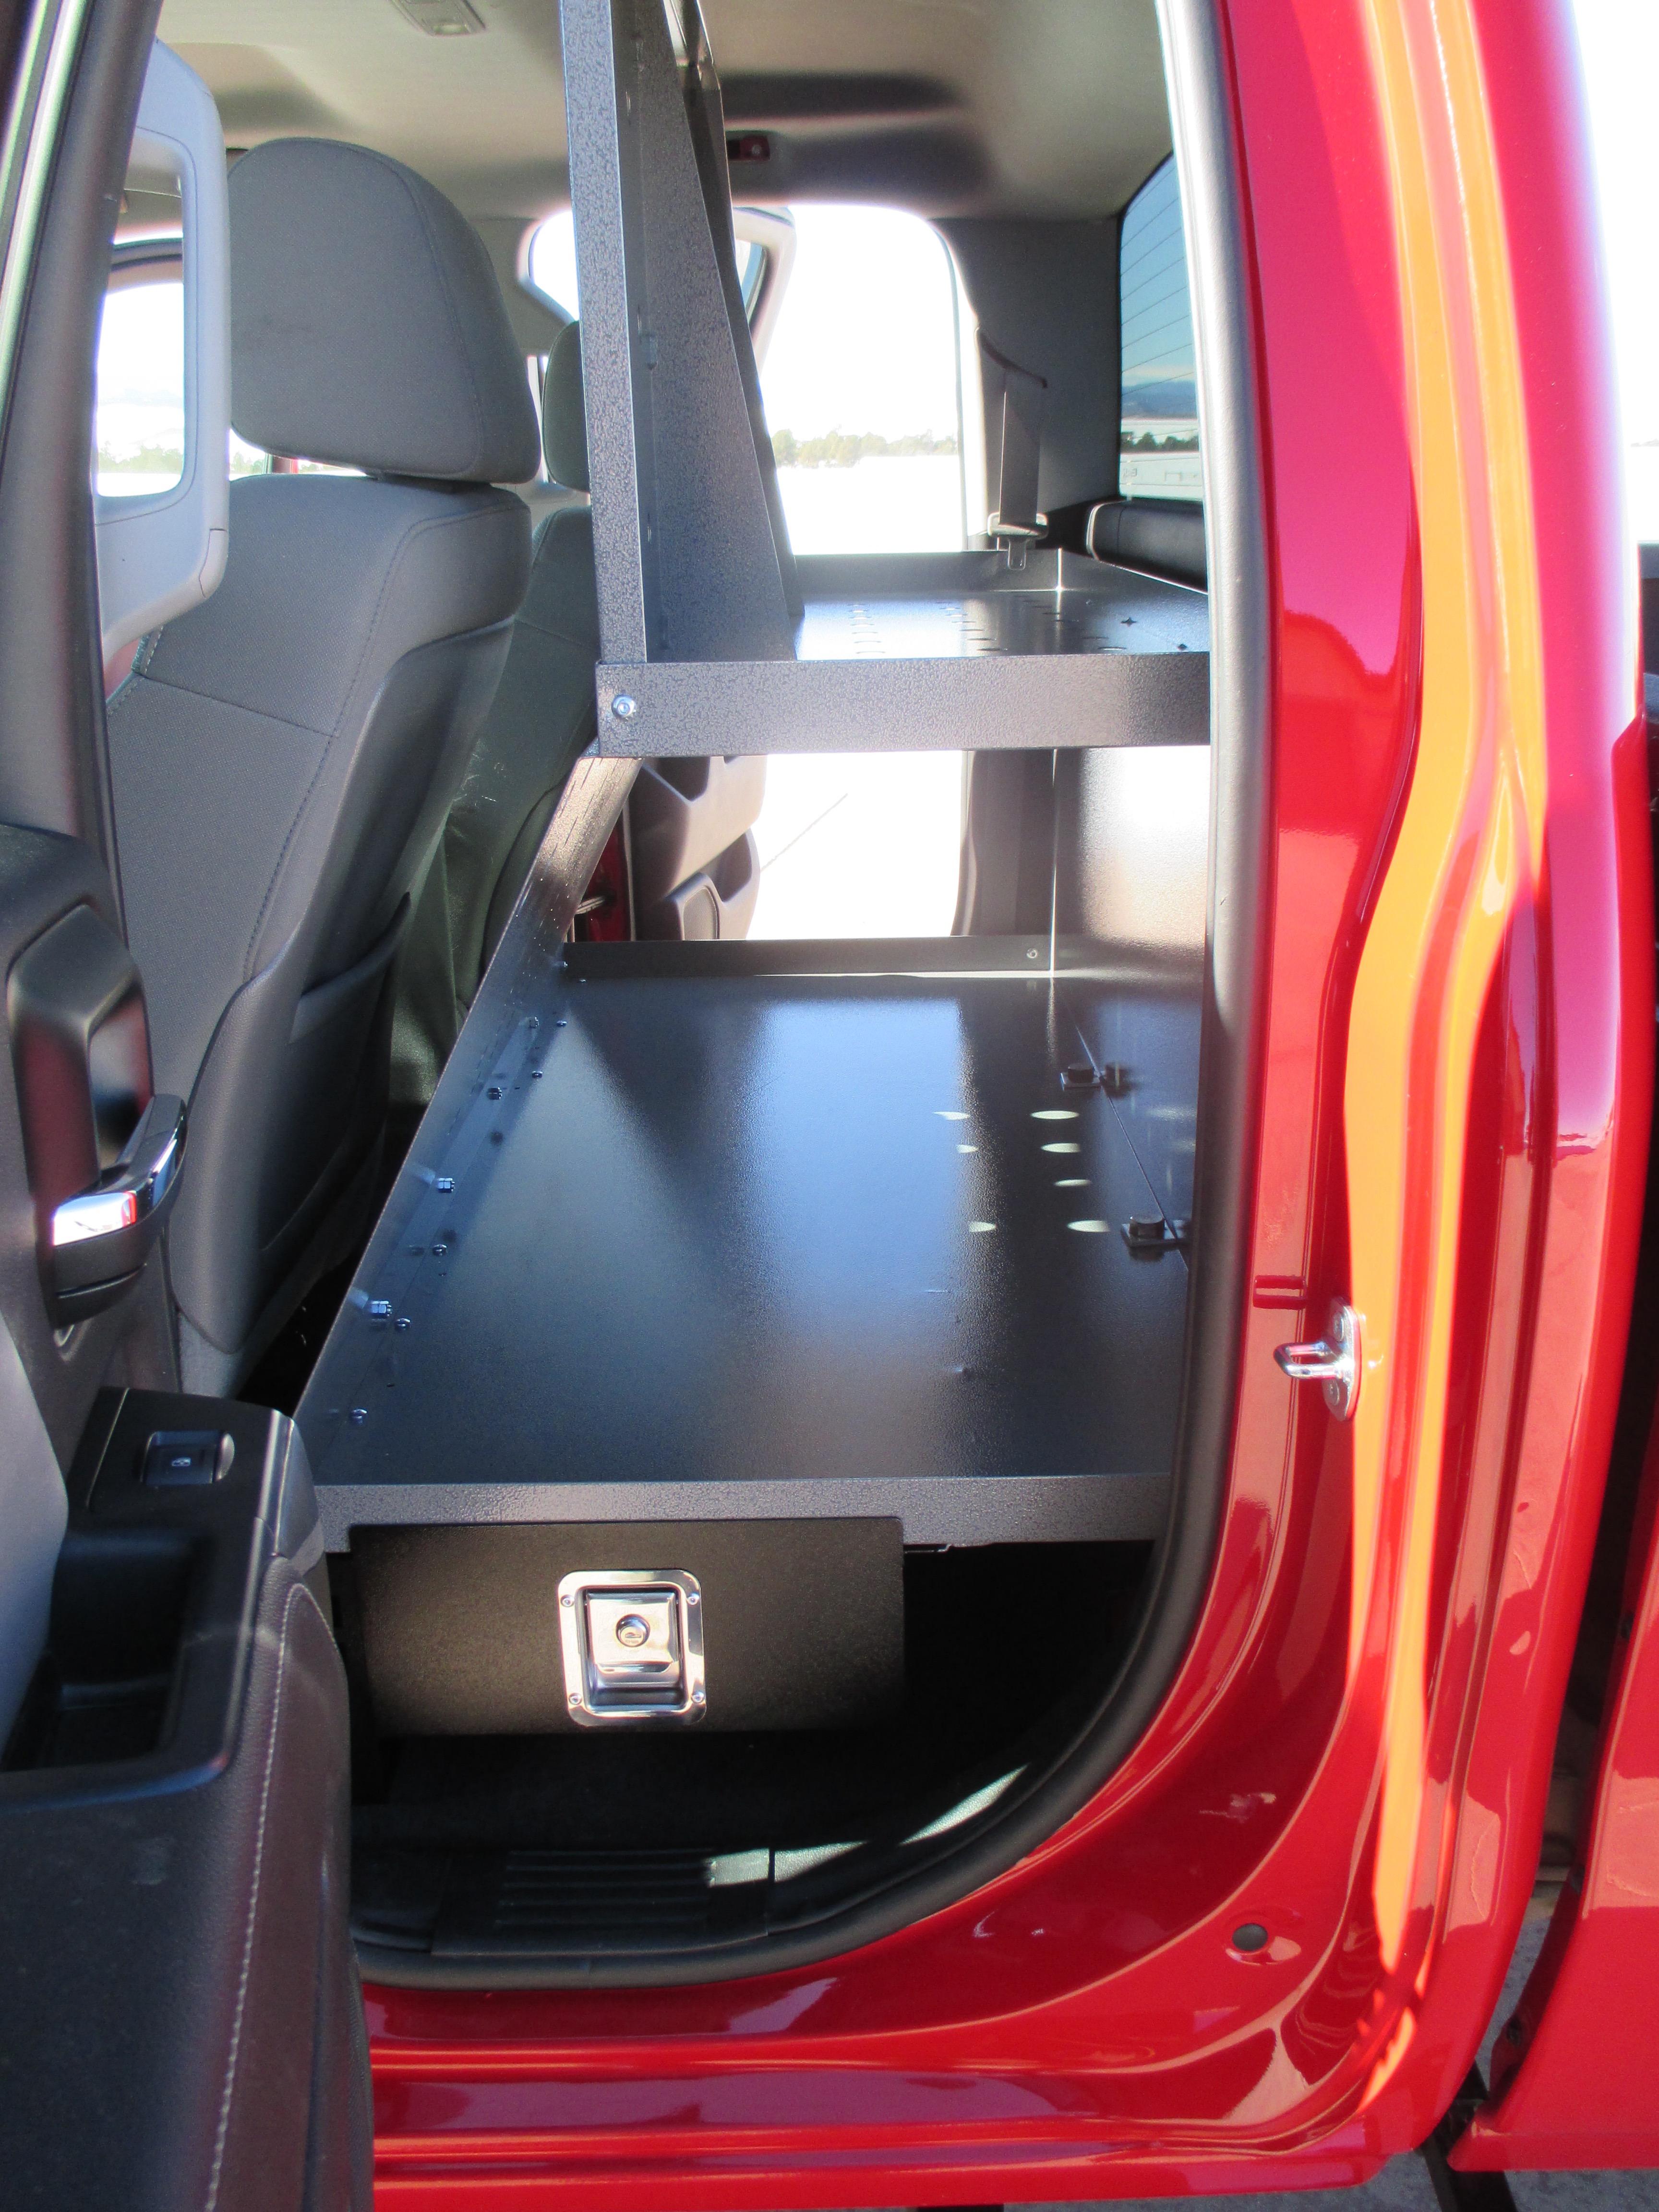 Cargodeck Truckoffice Truck Cab Storage Systems